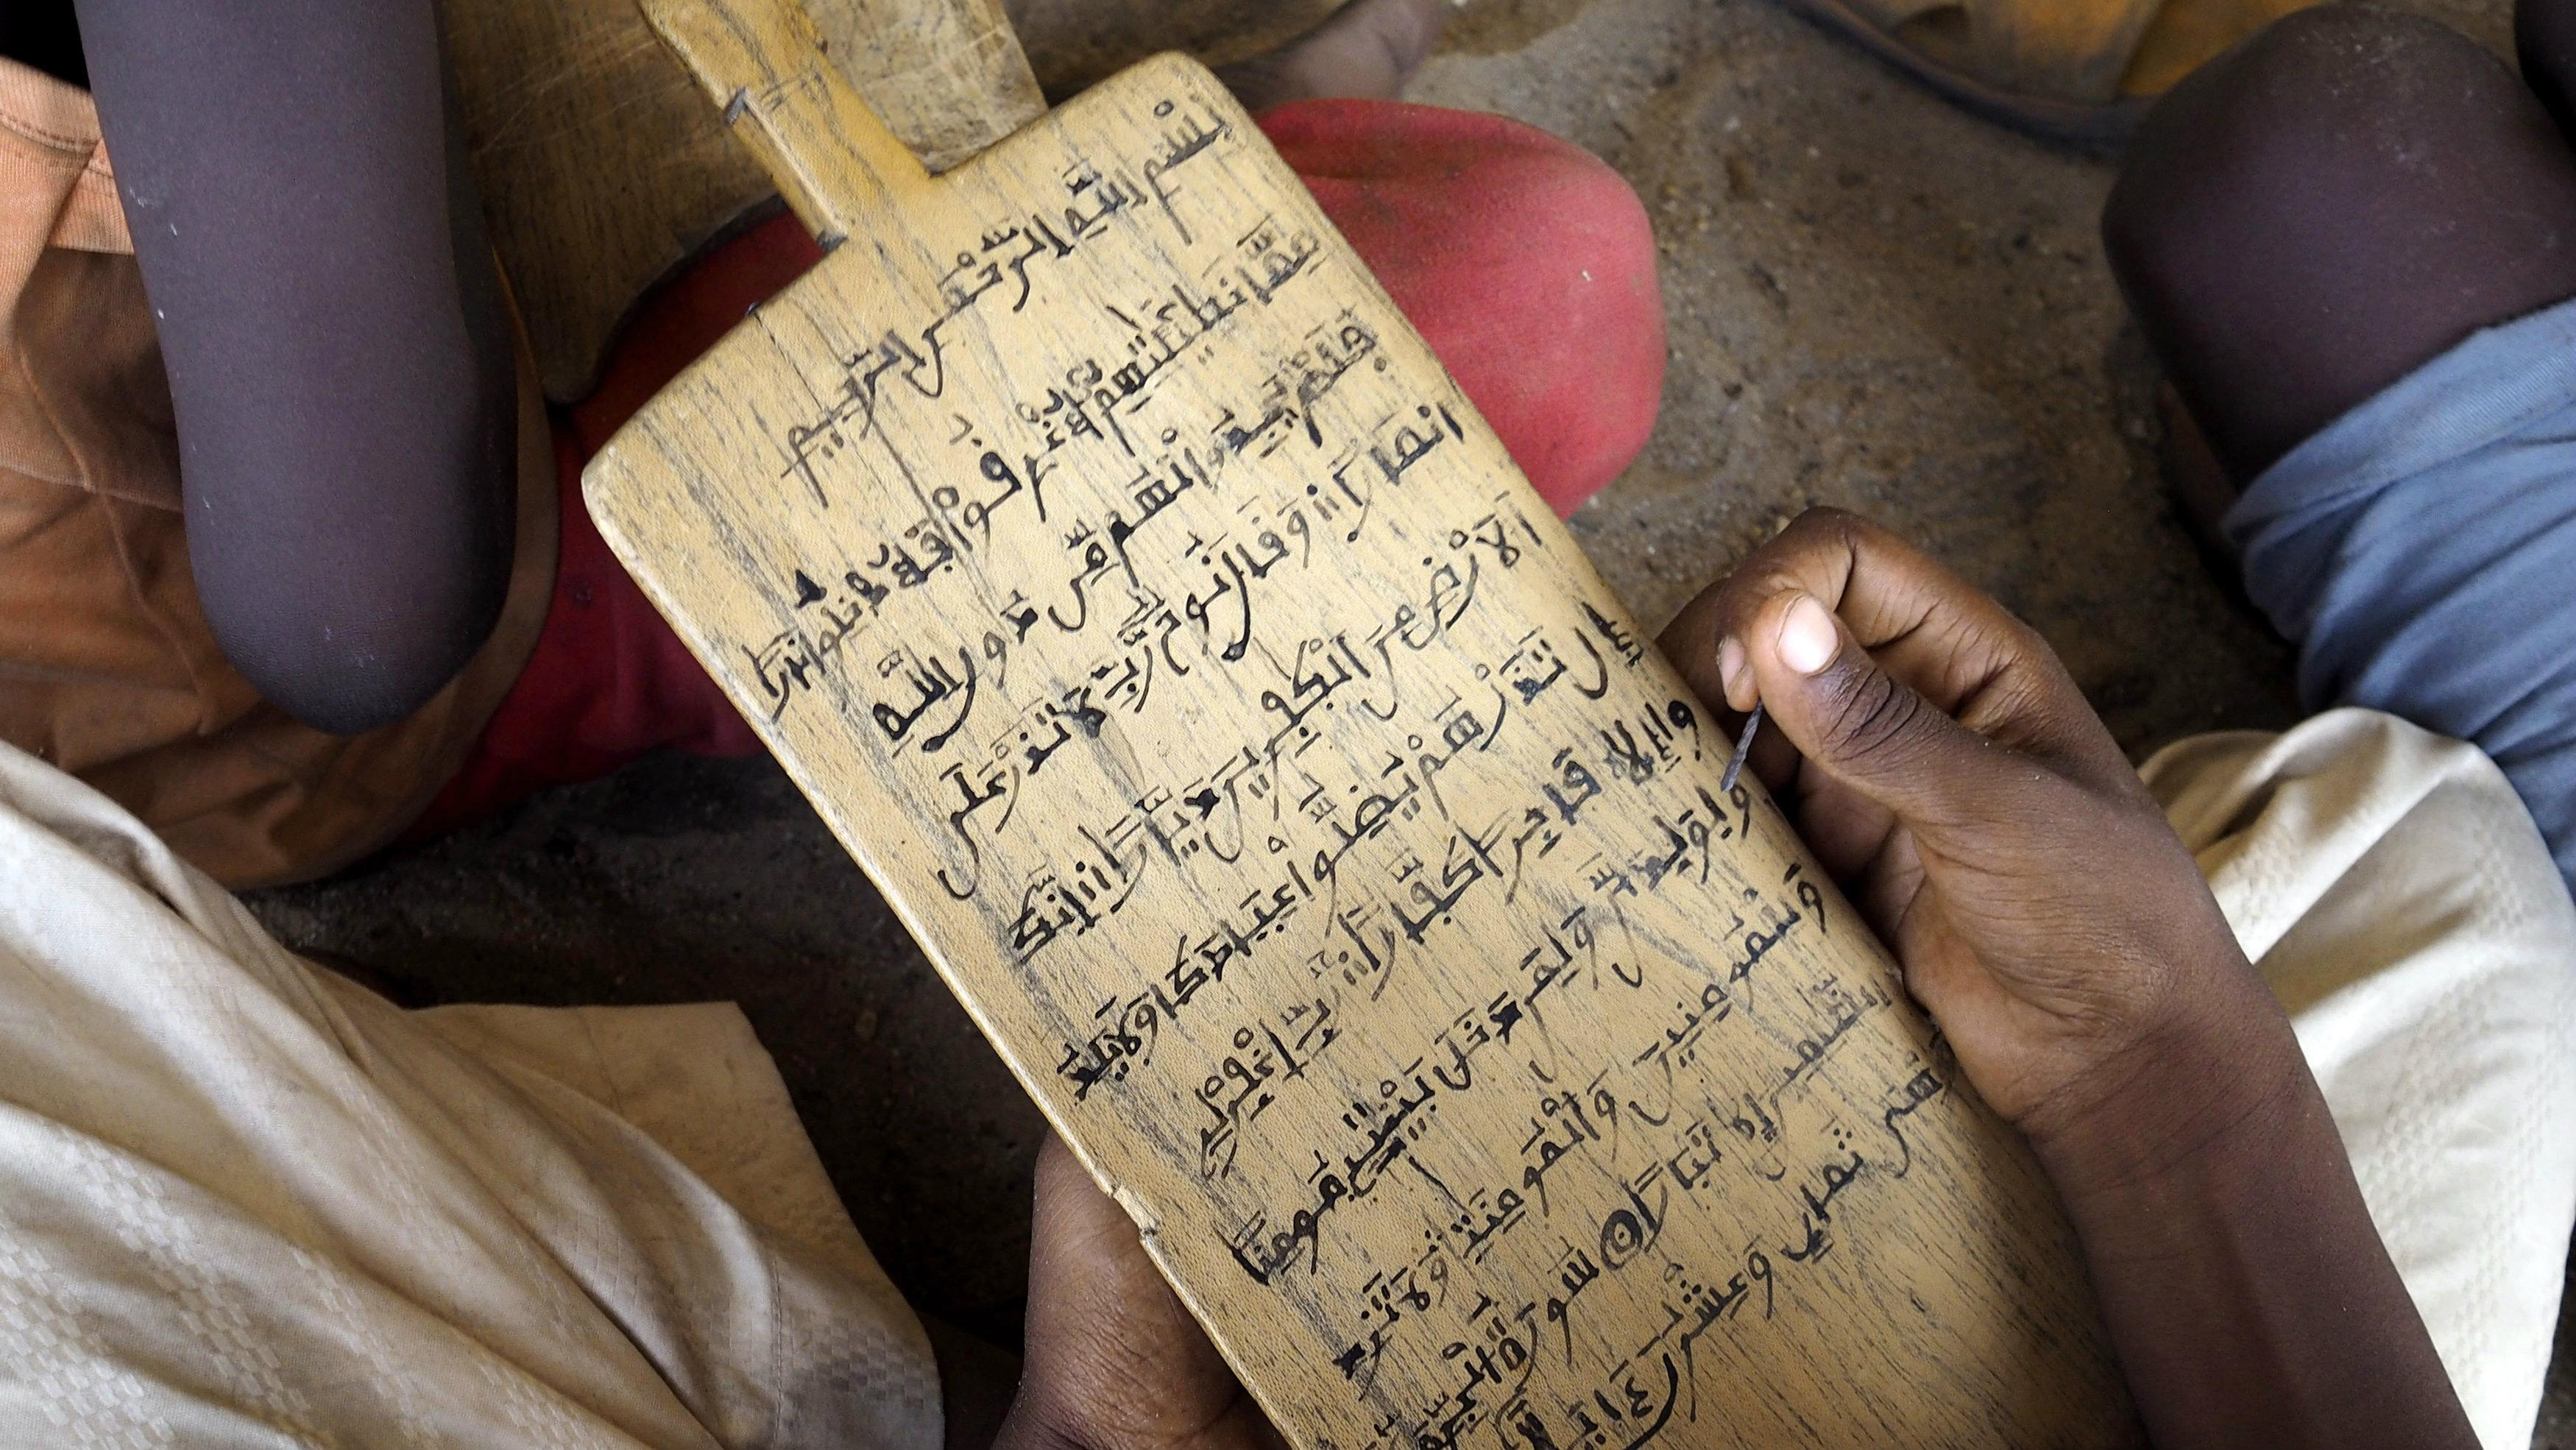 A boy holds a slate of wood with Quranic verses written on them at an Almajiri Islamic school in Maiduguri, Nigeria, May 24, 2014.